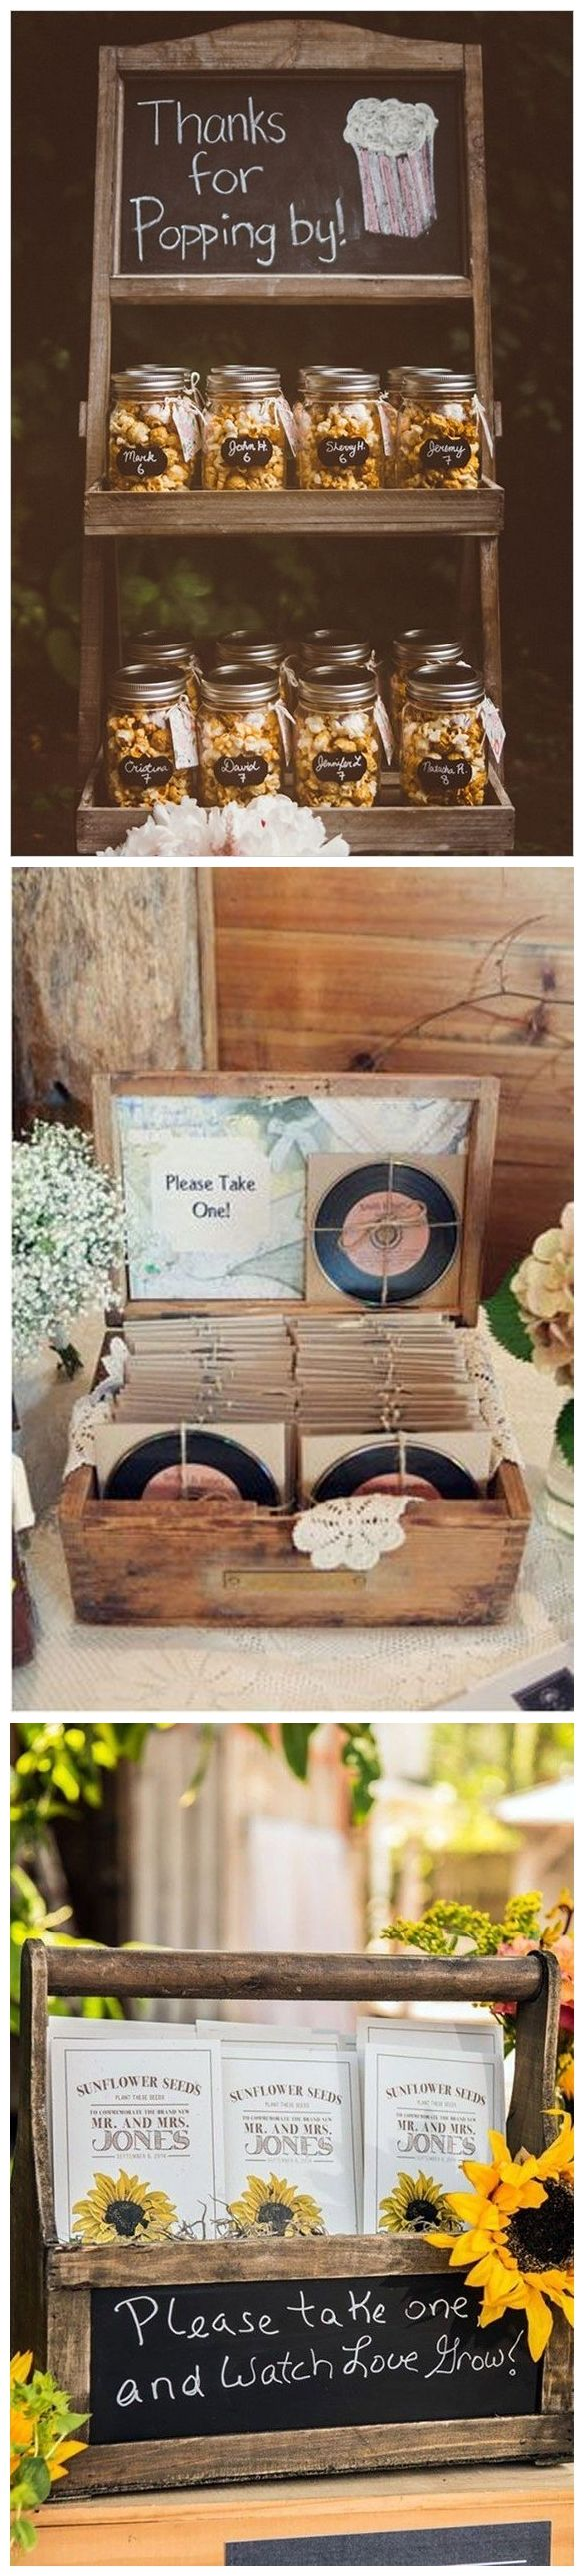 Edible Wedding Favor Ideas We Love /   http://www.himisspuff.com/cute-fun-wedding-favor-ideas/